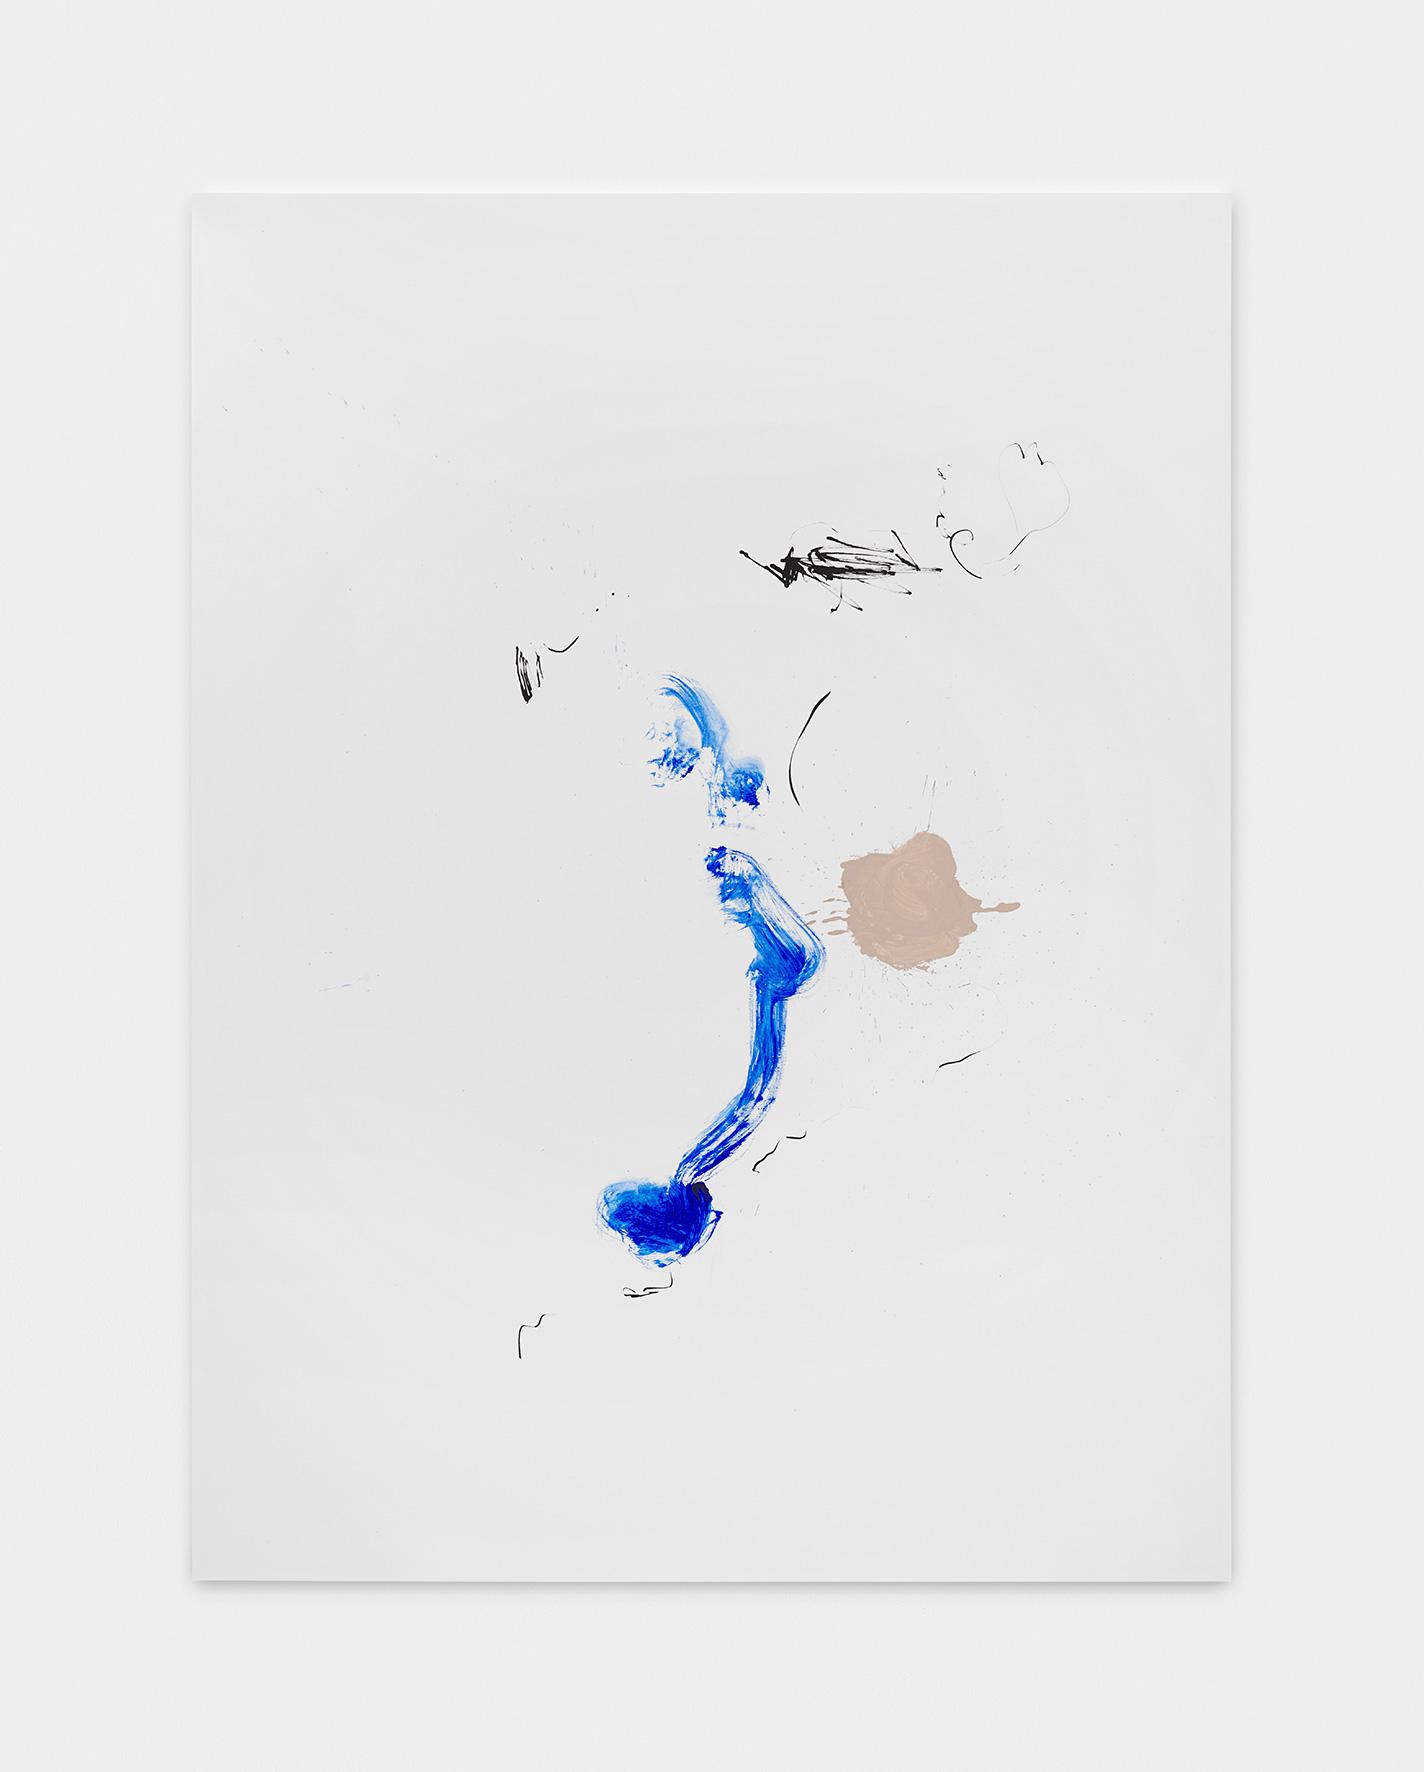 181222 | 2018 | Acryl, Lack, Tusche auf Leinwand | 200 x 150 cm | ©GALERIE ALBER